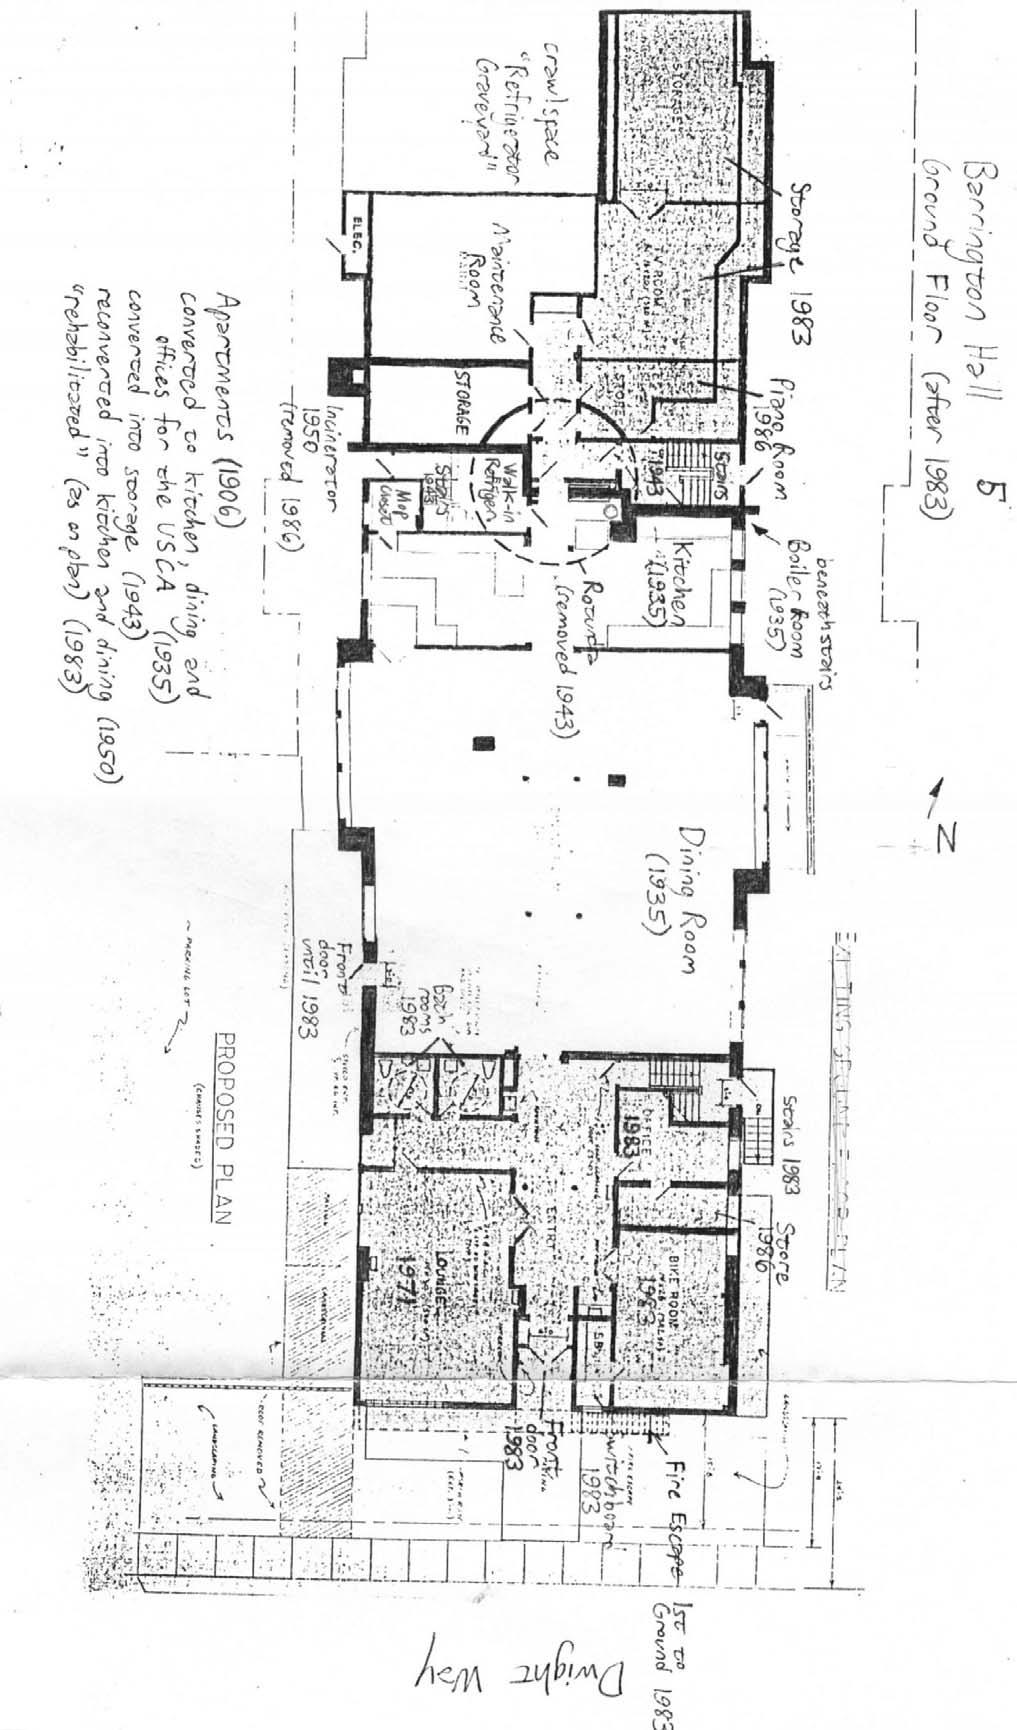 barrington hall architectural history